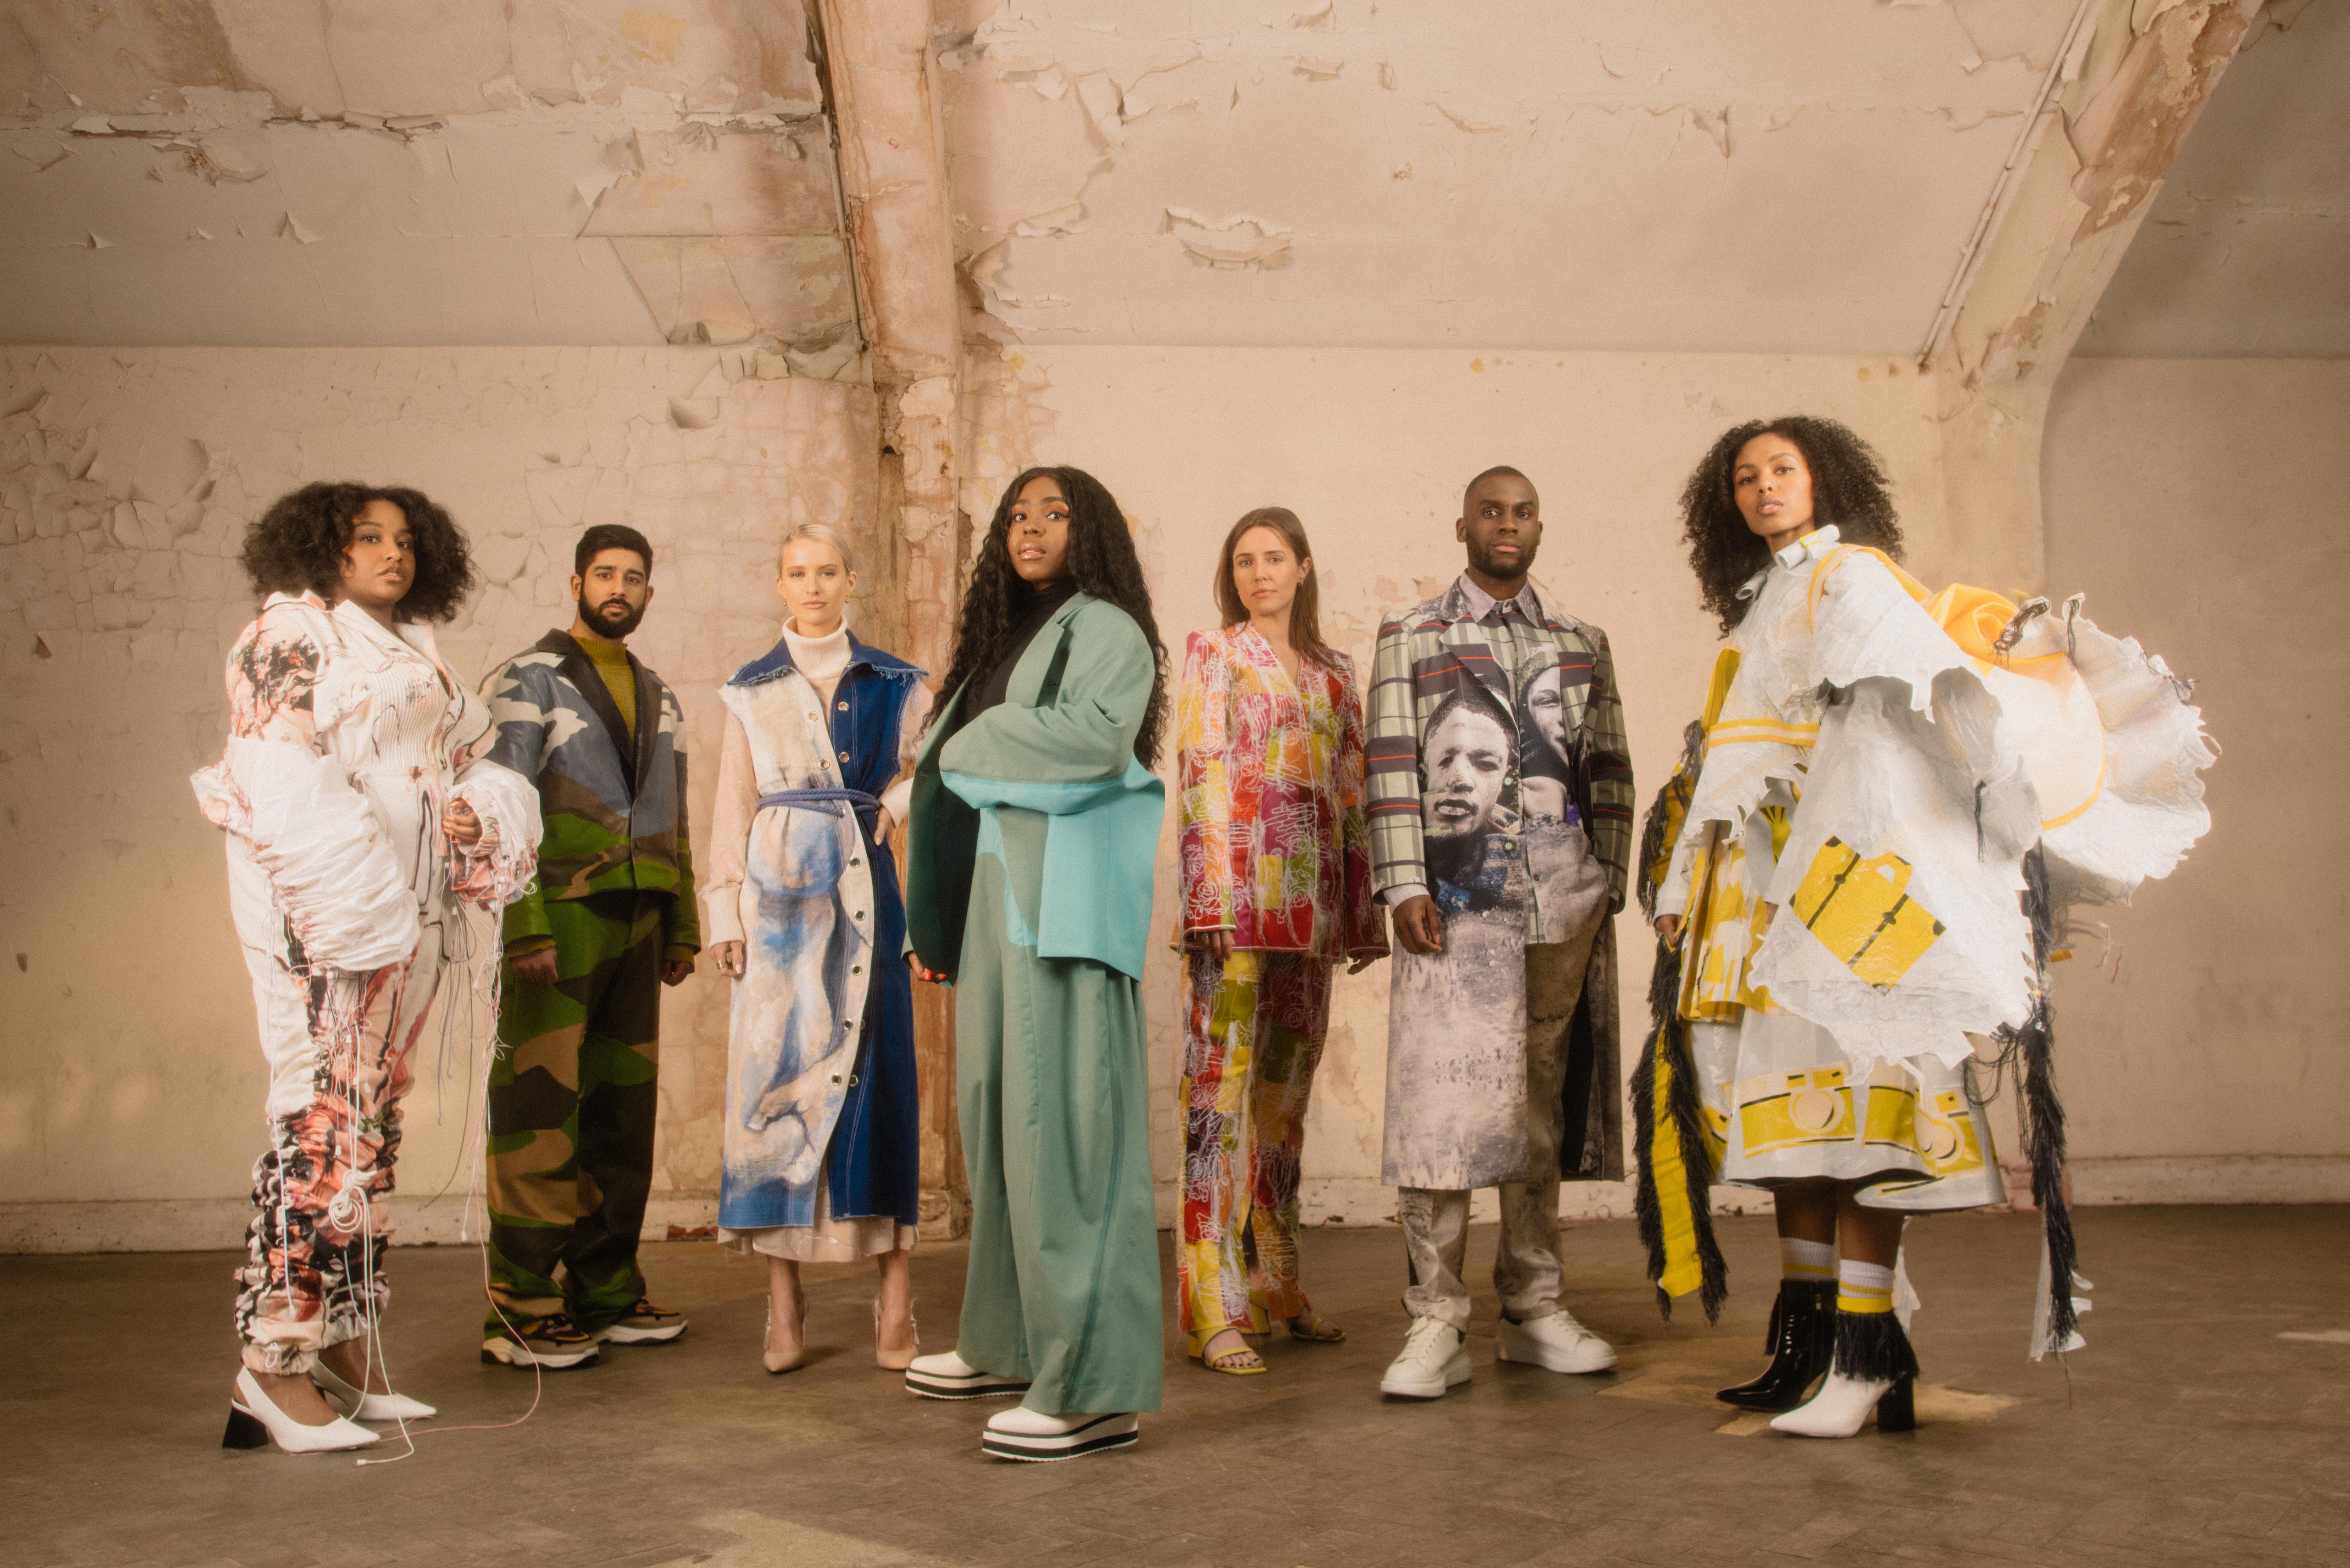 BA-Hons-Fashion-Communication-and-Promotion-Marta-Zaremba-Graduate-Fashion-Week-2019